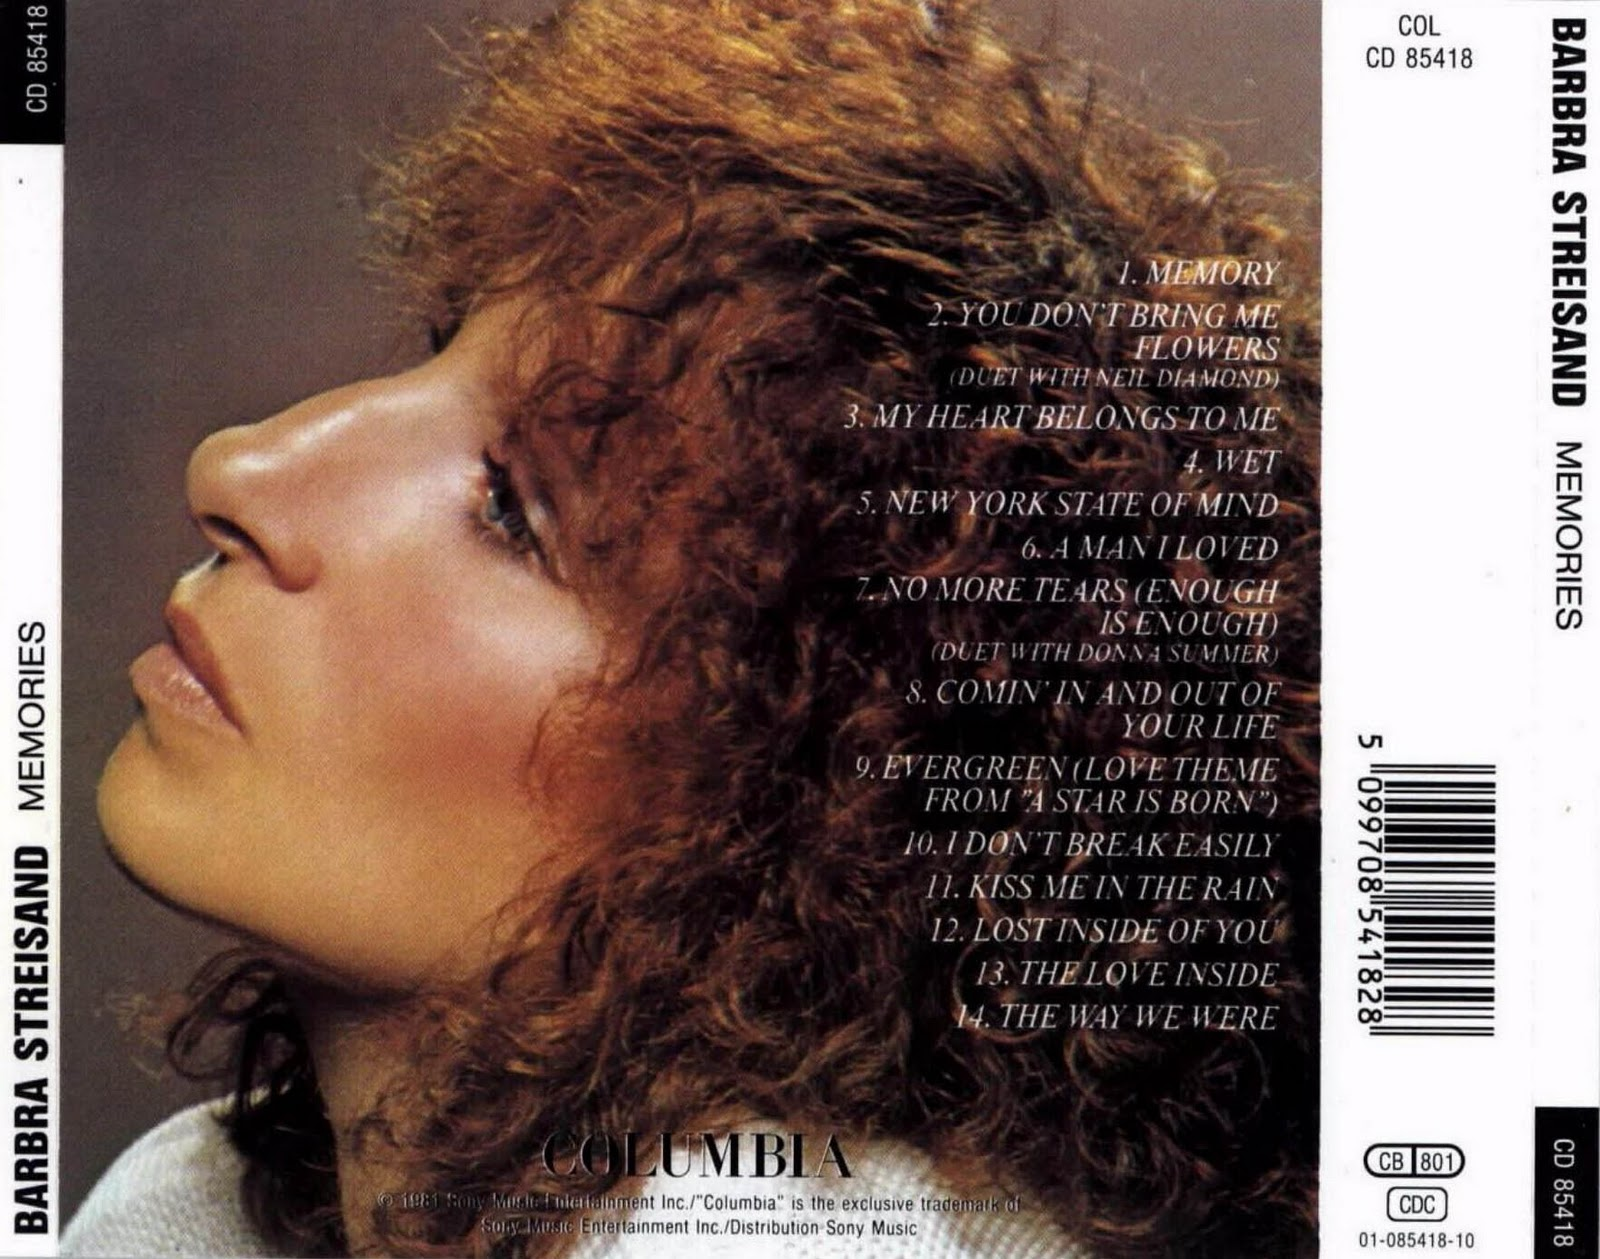 http://1.bp.blogspot.com/_9Izdq8bedtQ/TUOnGx3tZ_I/AAAAAAAAiaY/UtS4xMUqvi8/s1600/Barbra_Streisand-Memories-Trasera.jpg